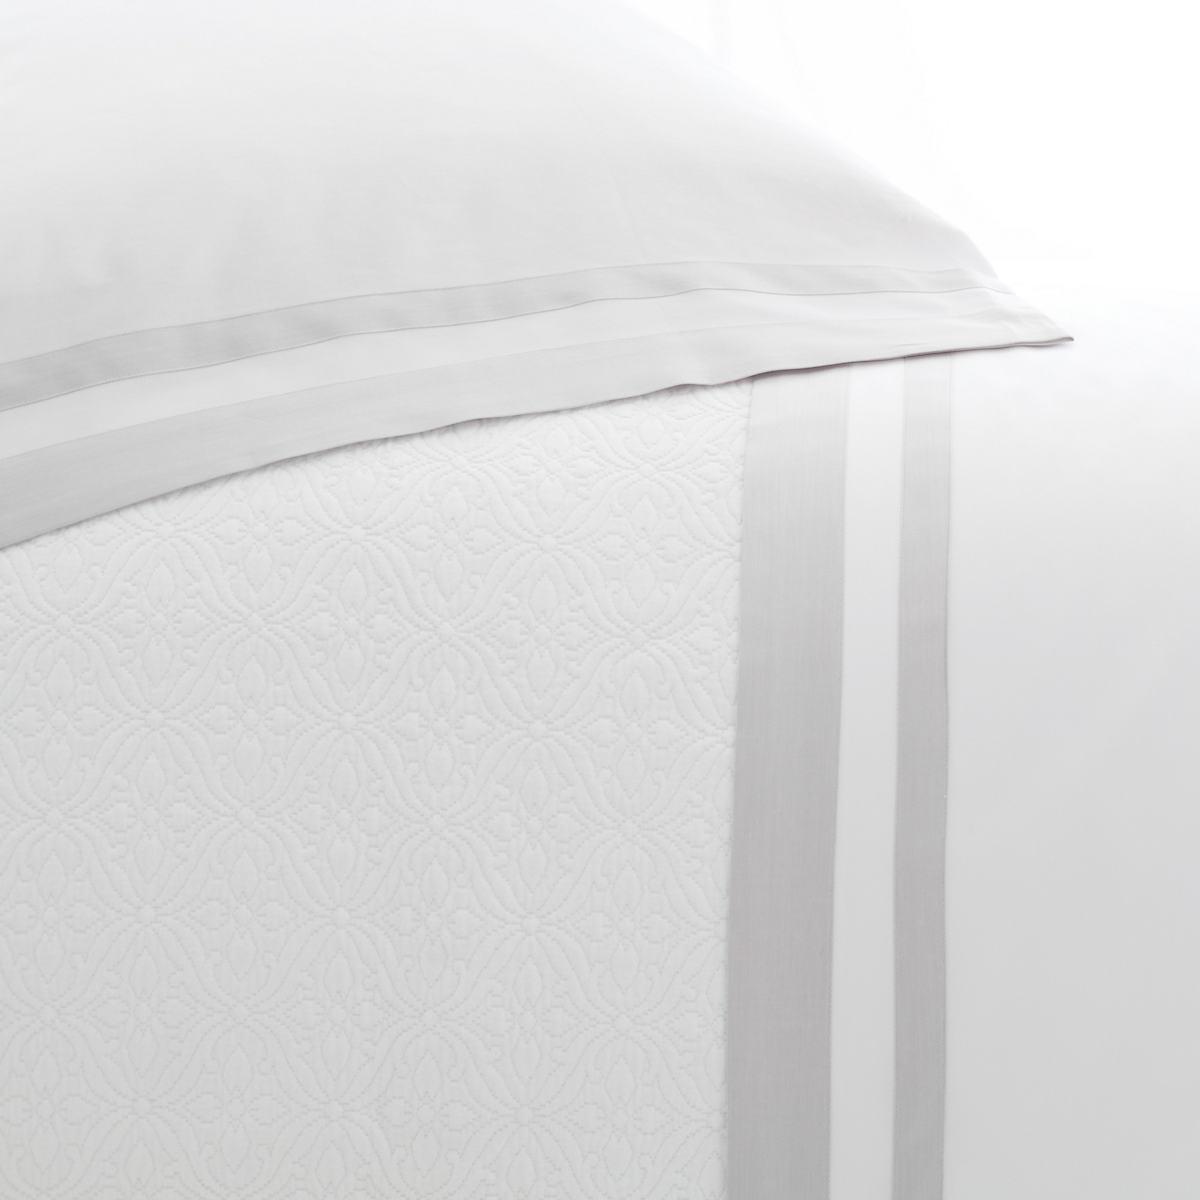 Piazza White/Zinc Pillowcases